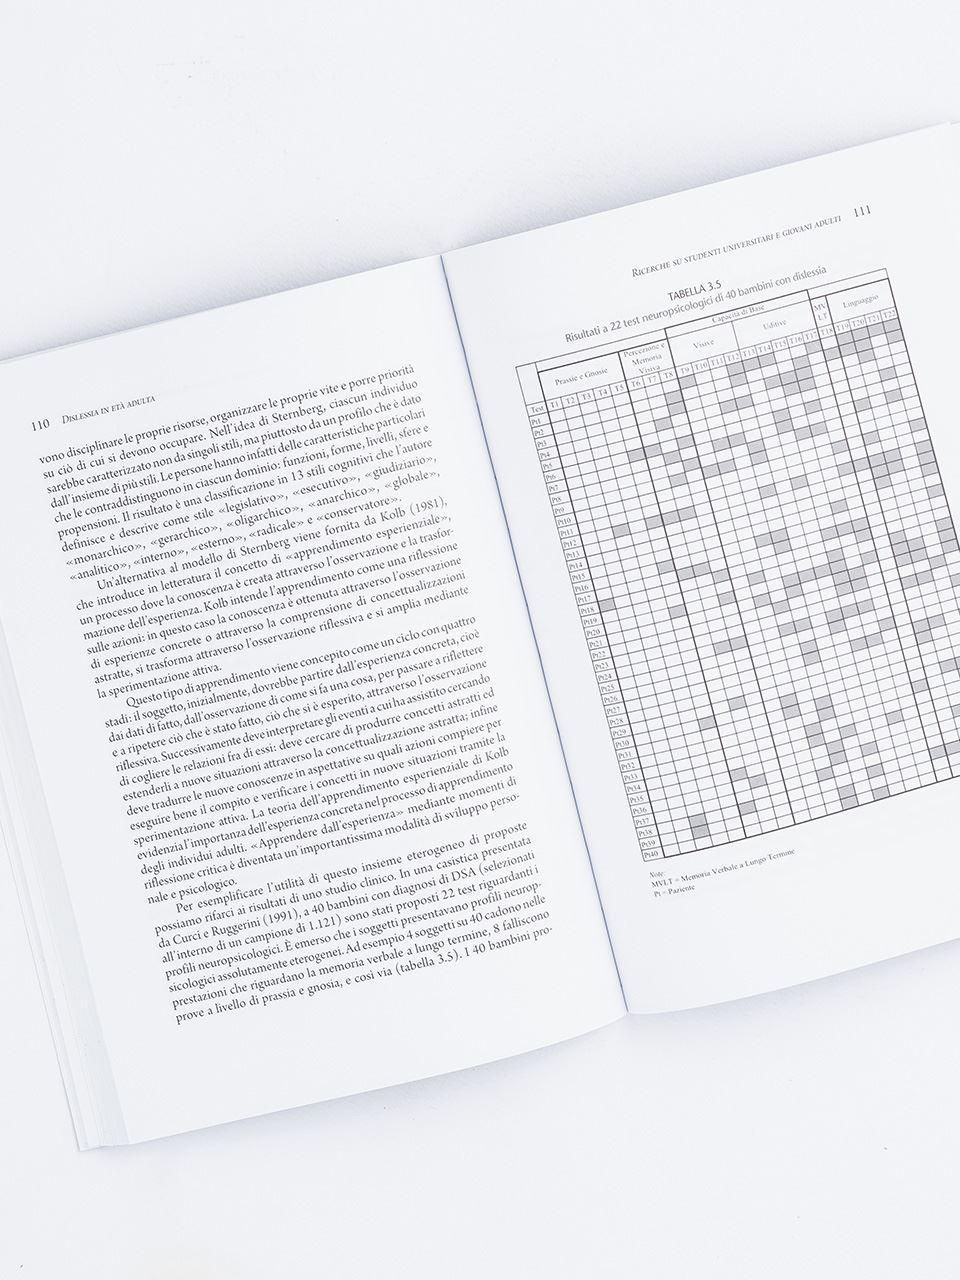 Dislessia in età adulta - Libri - Erickson 2